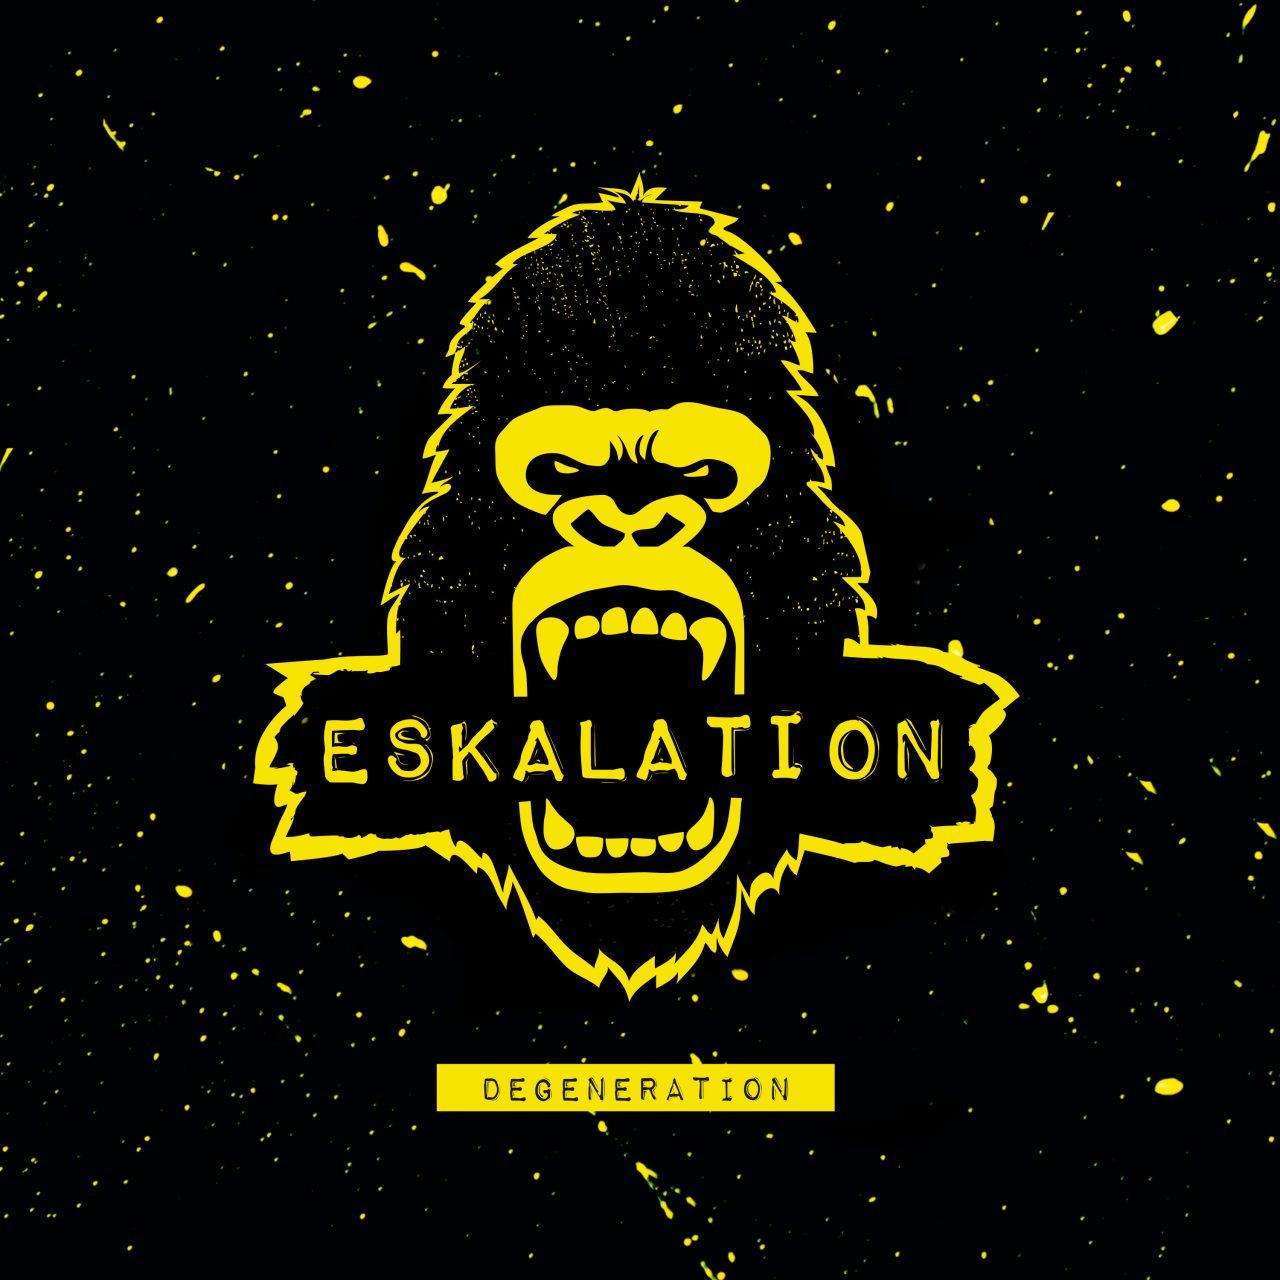 Eskalation – Degeneration